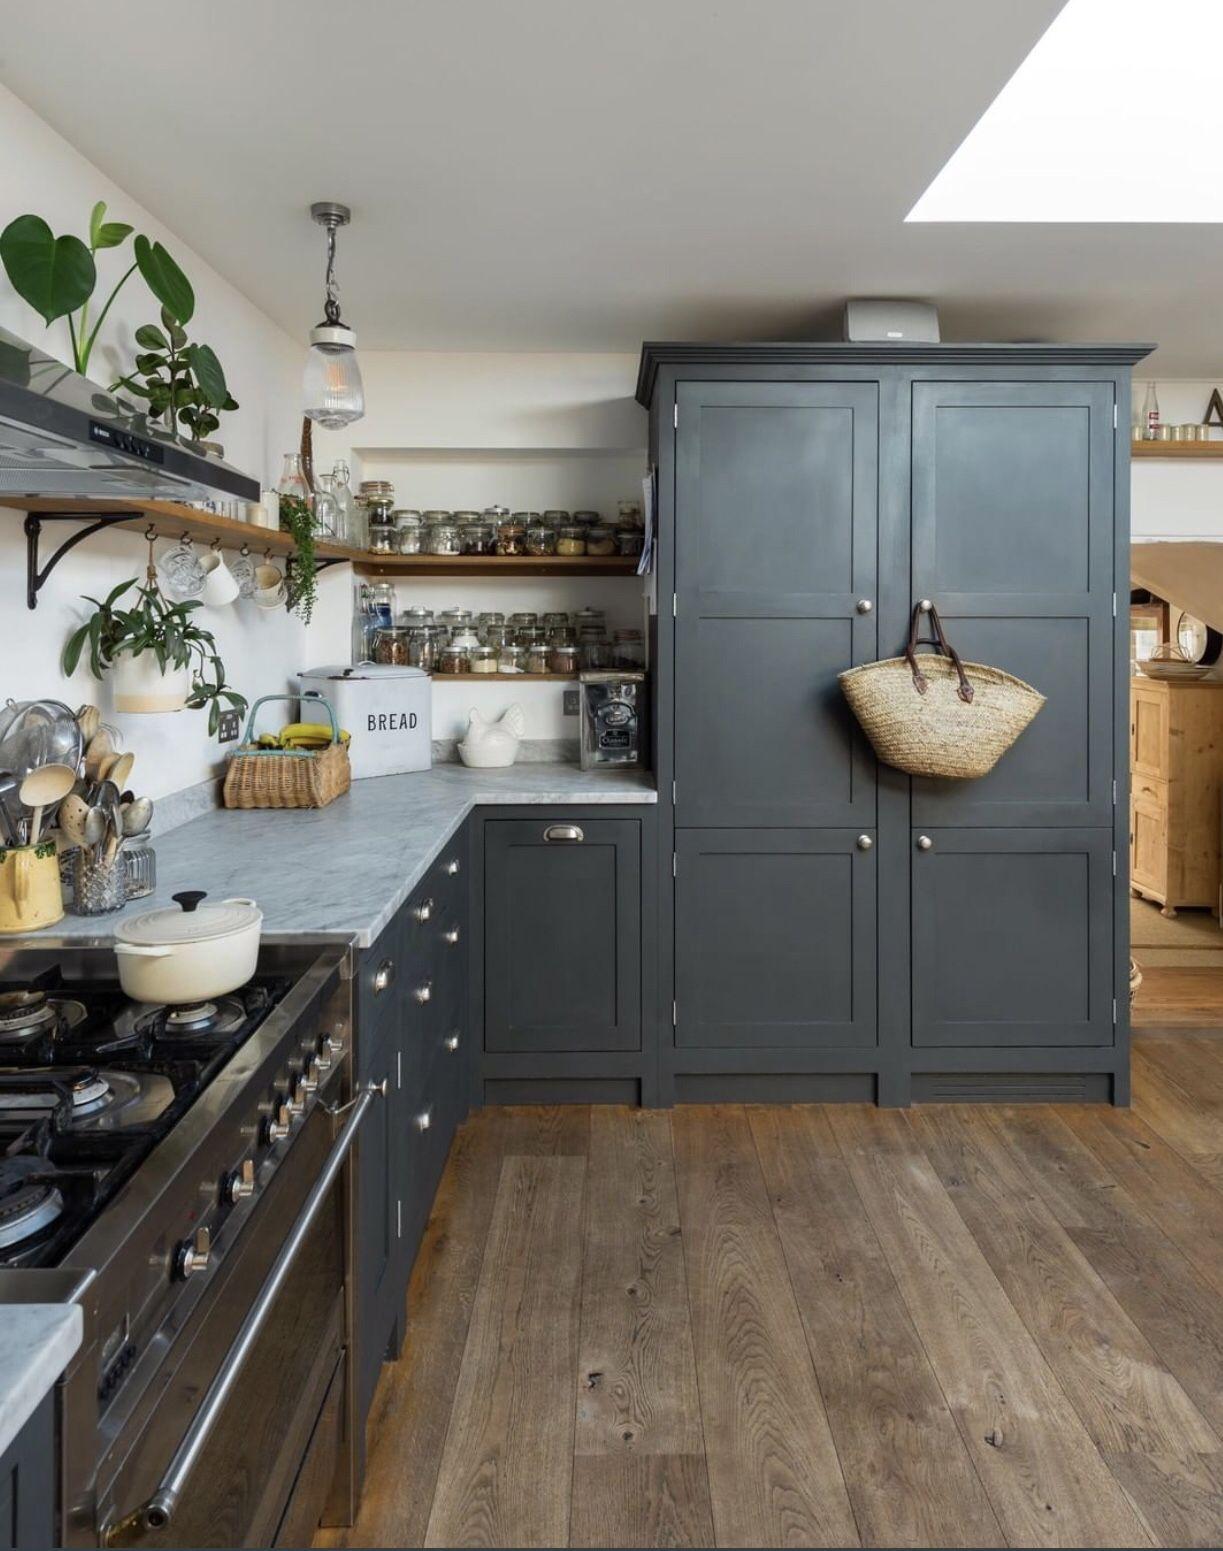 Grey Rustic Modern Kitchen Designs In 2020 Grey Kitchen Designs Grey Shaker Kitchen Rustic Modern Kitchen